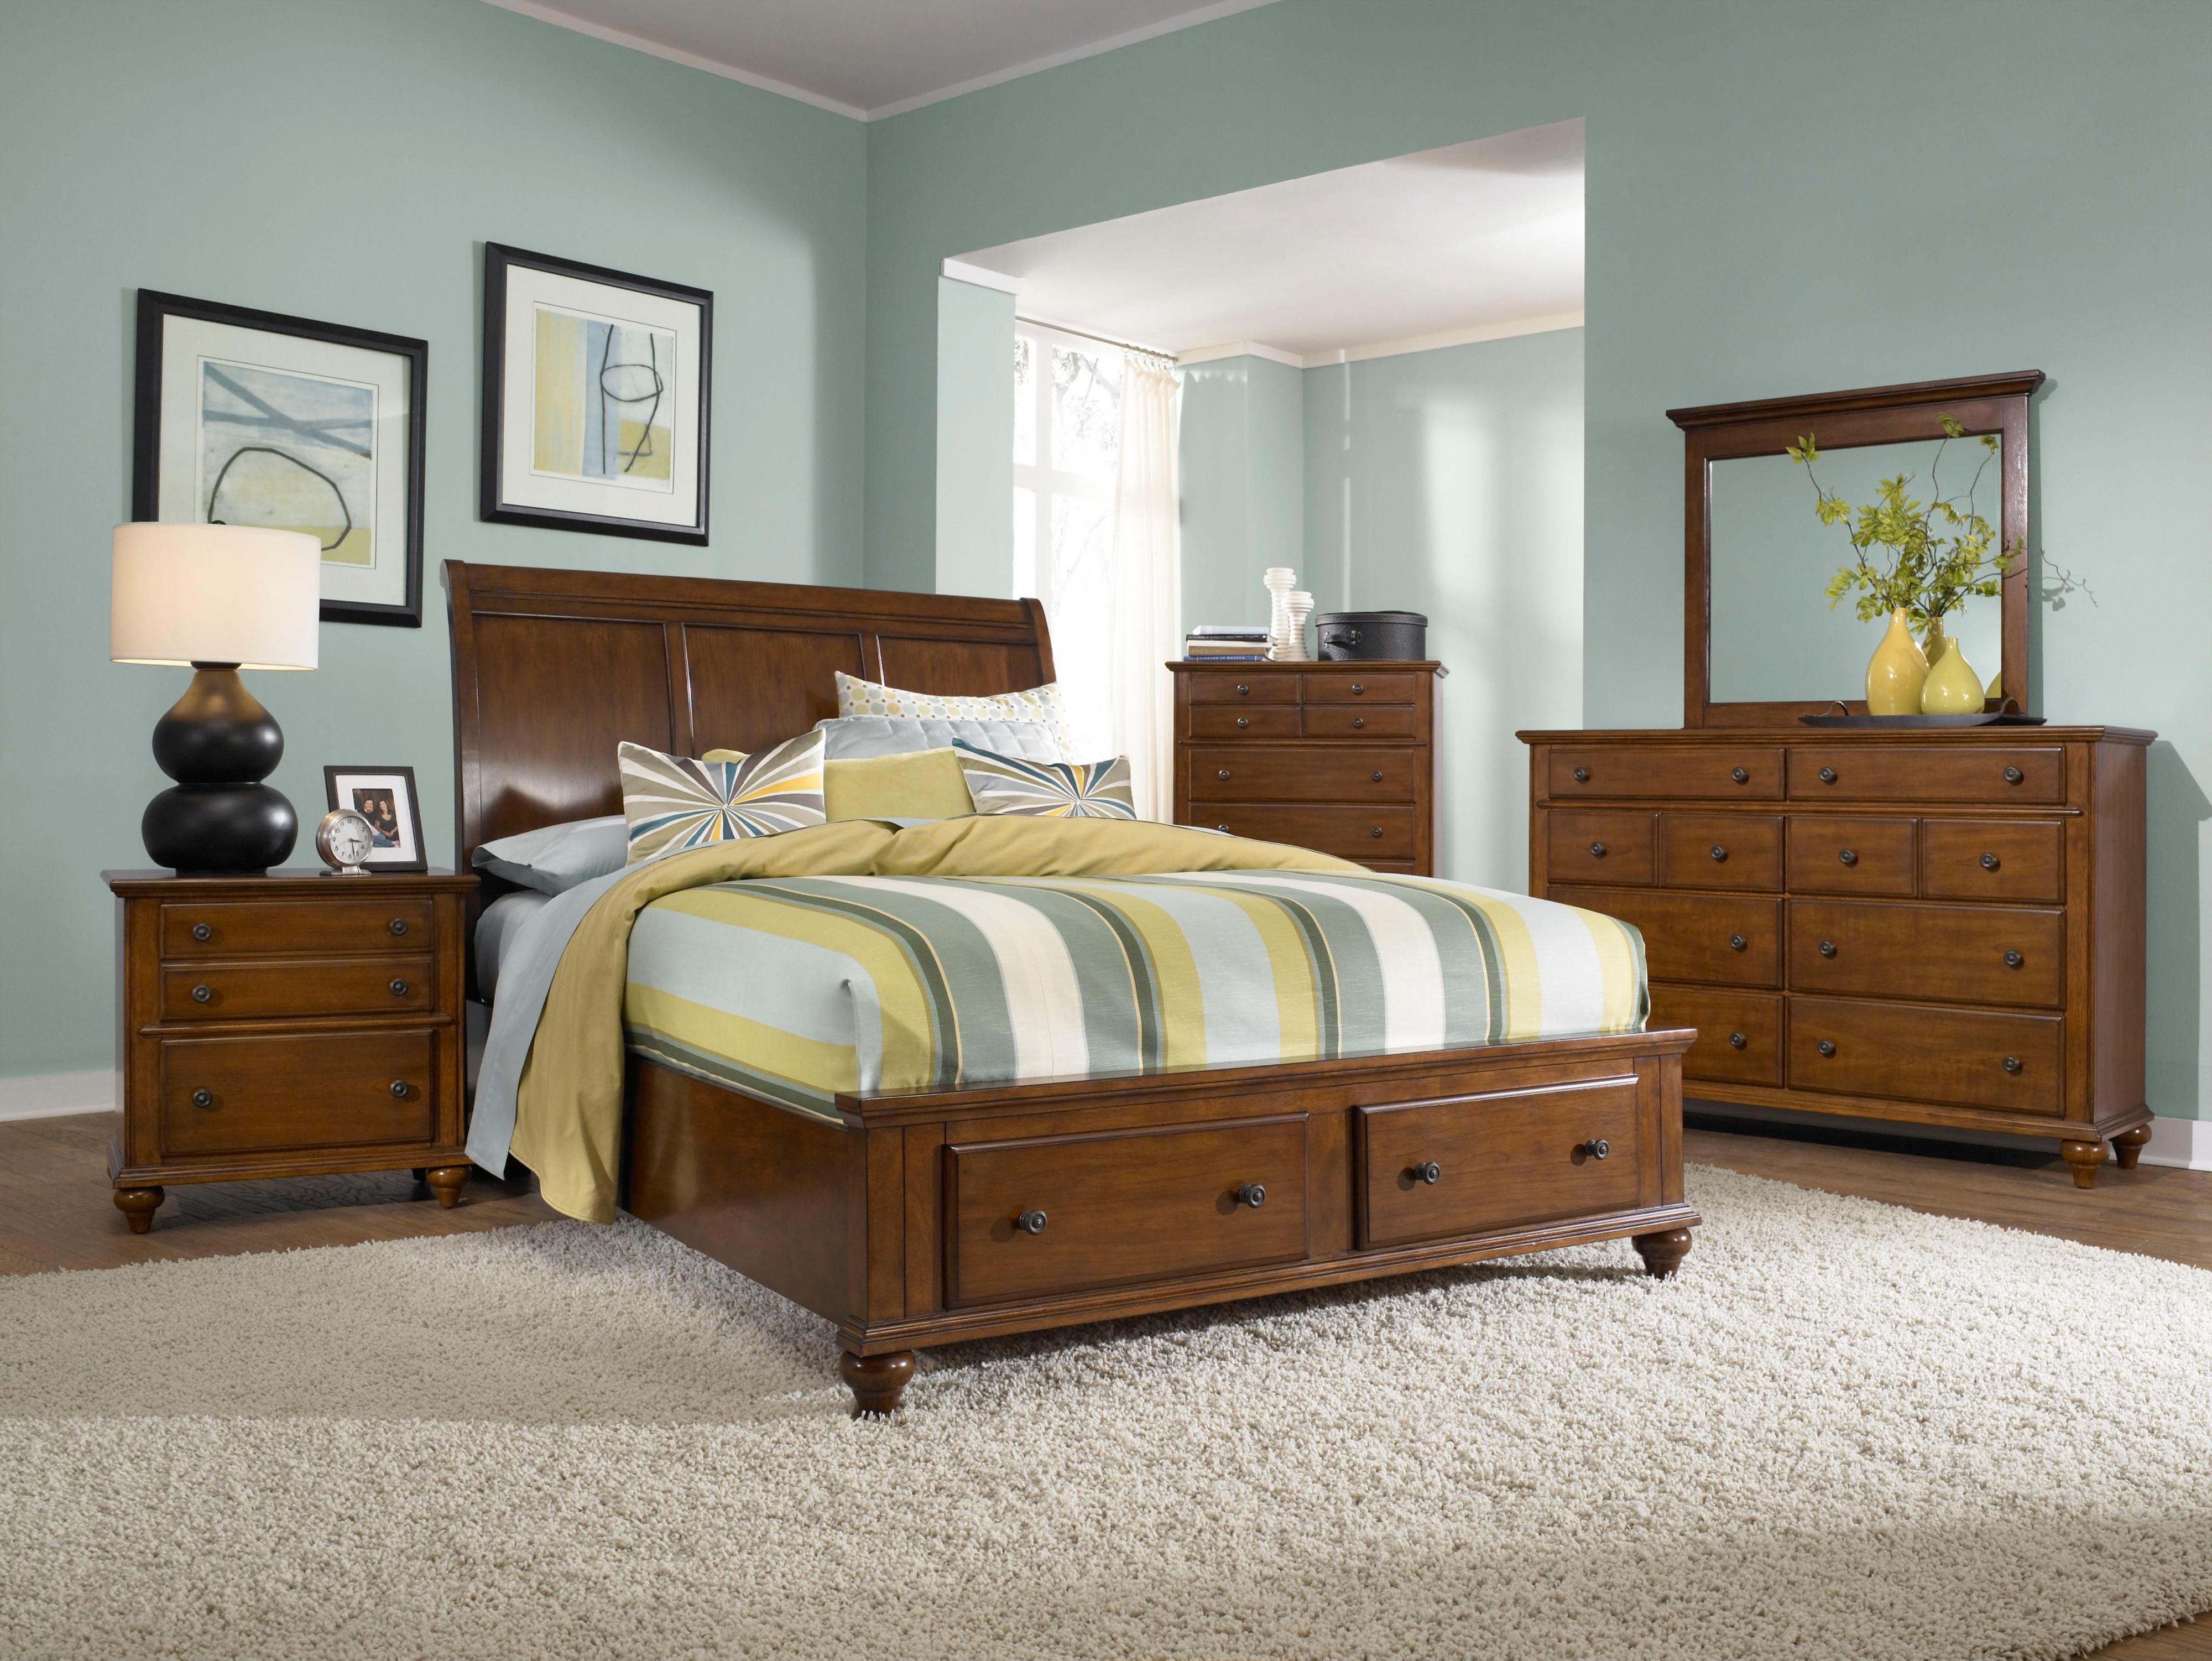 Broyhill Furniture Hayden Place King Bedroom Group - Item Number: 4648 K Bedroom Group 4